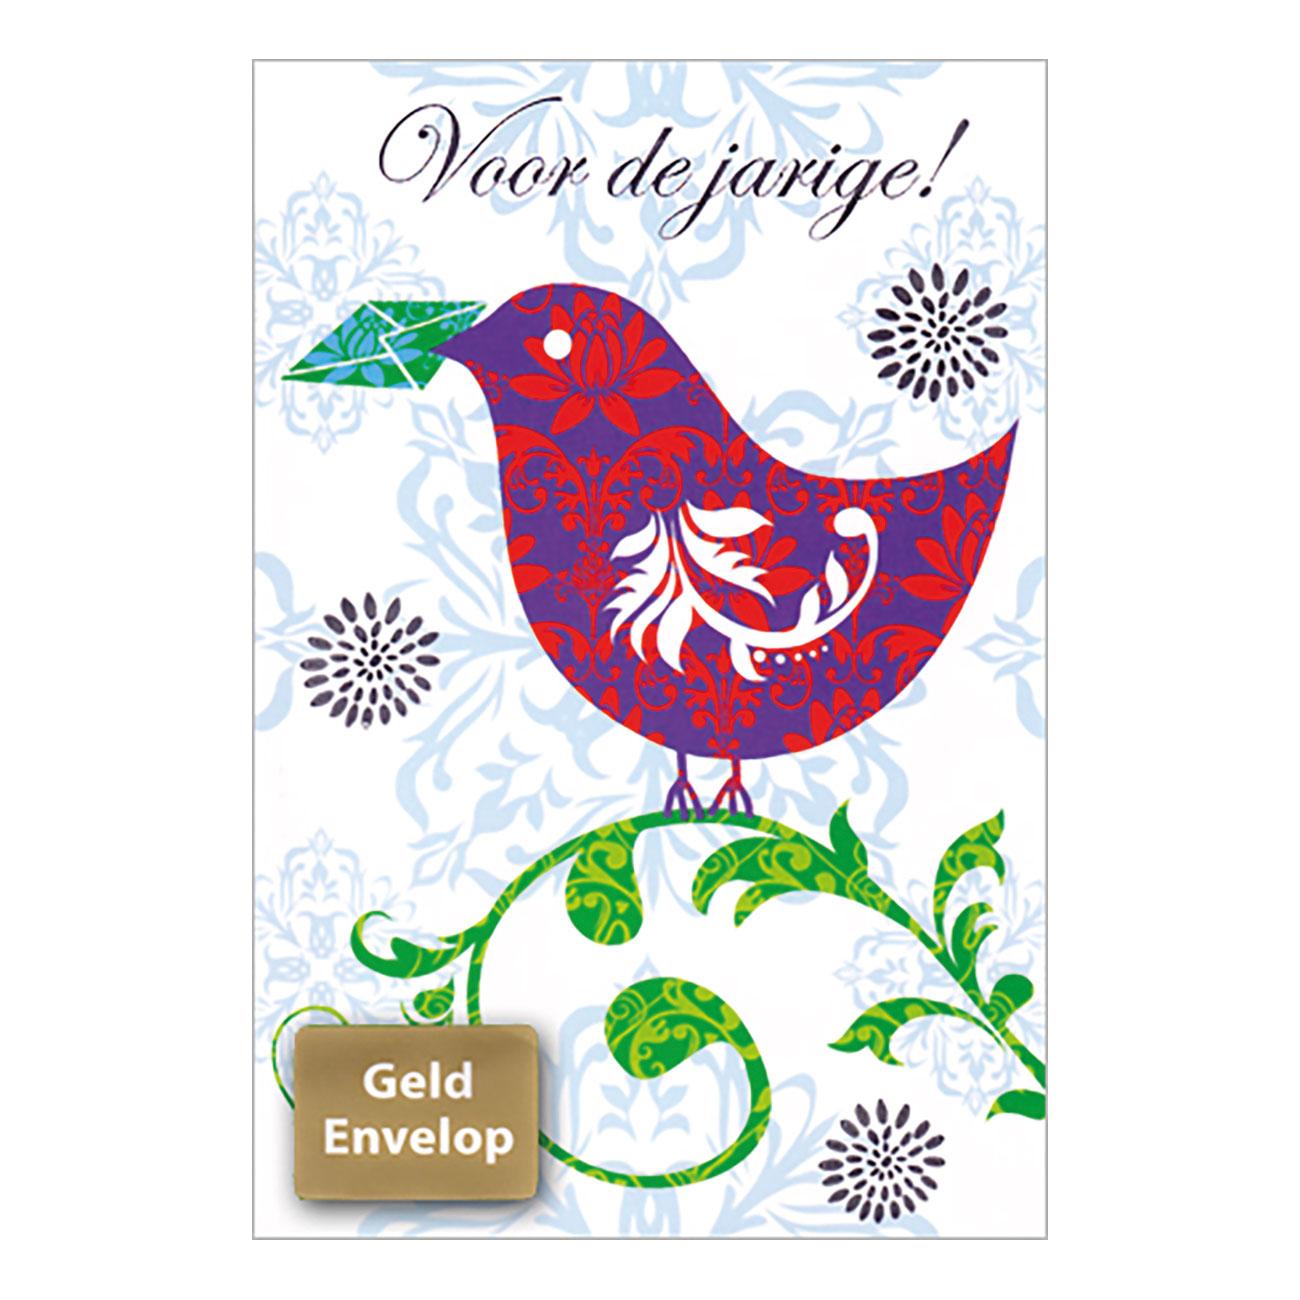 Wenskaart Verjaardag Vogel Met Geldenvelop Online Kopen Lobbes Nl